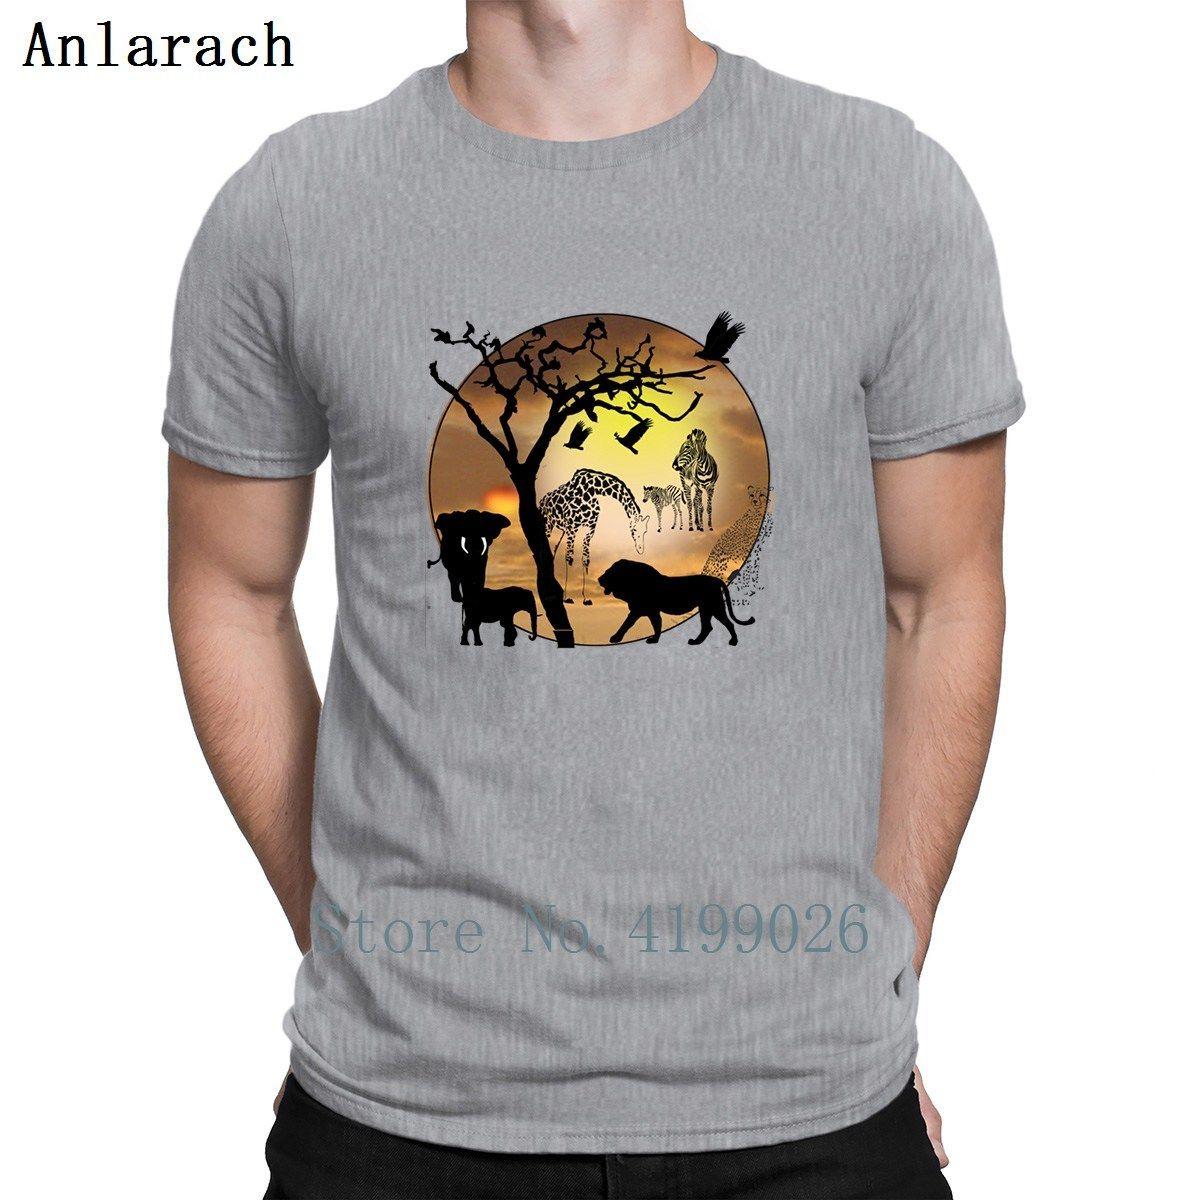 cd48e45a Safari African Jungle Wild Animals Tshirts Top Quality Great Pattern Print  Men's Tshirt Big Sizes Funny Spring Anlarach Male